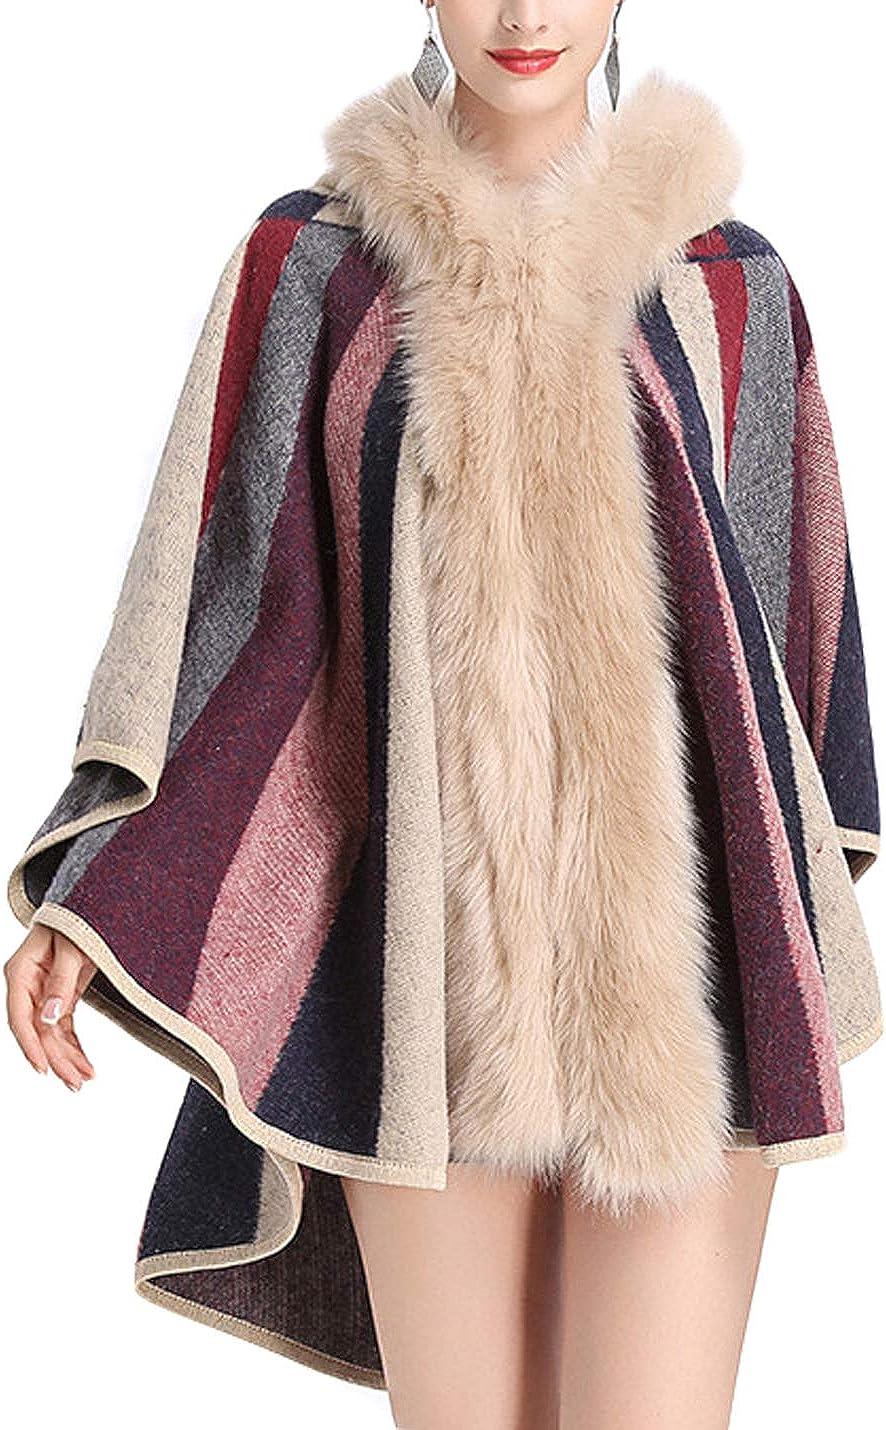 Gihuo Women's Vintage Batwing Faux Fur Hooded Cloak Poncho Cape Warm Shawl